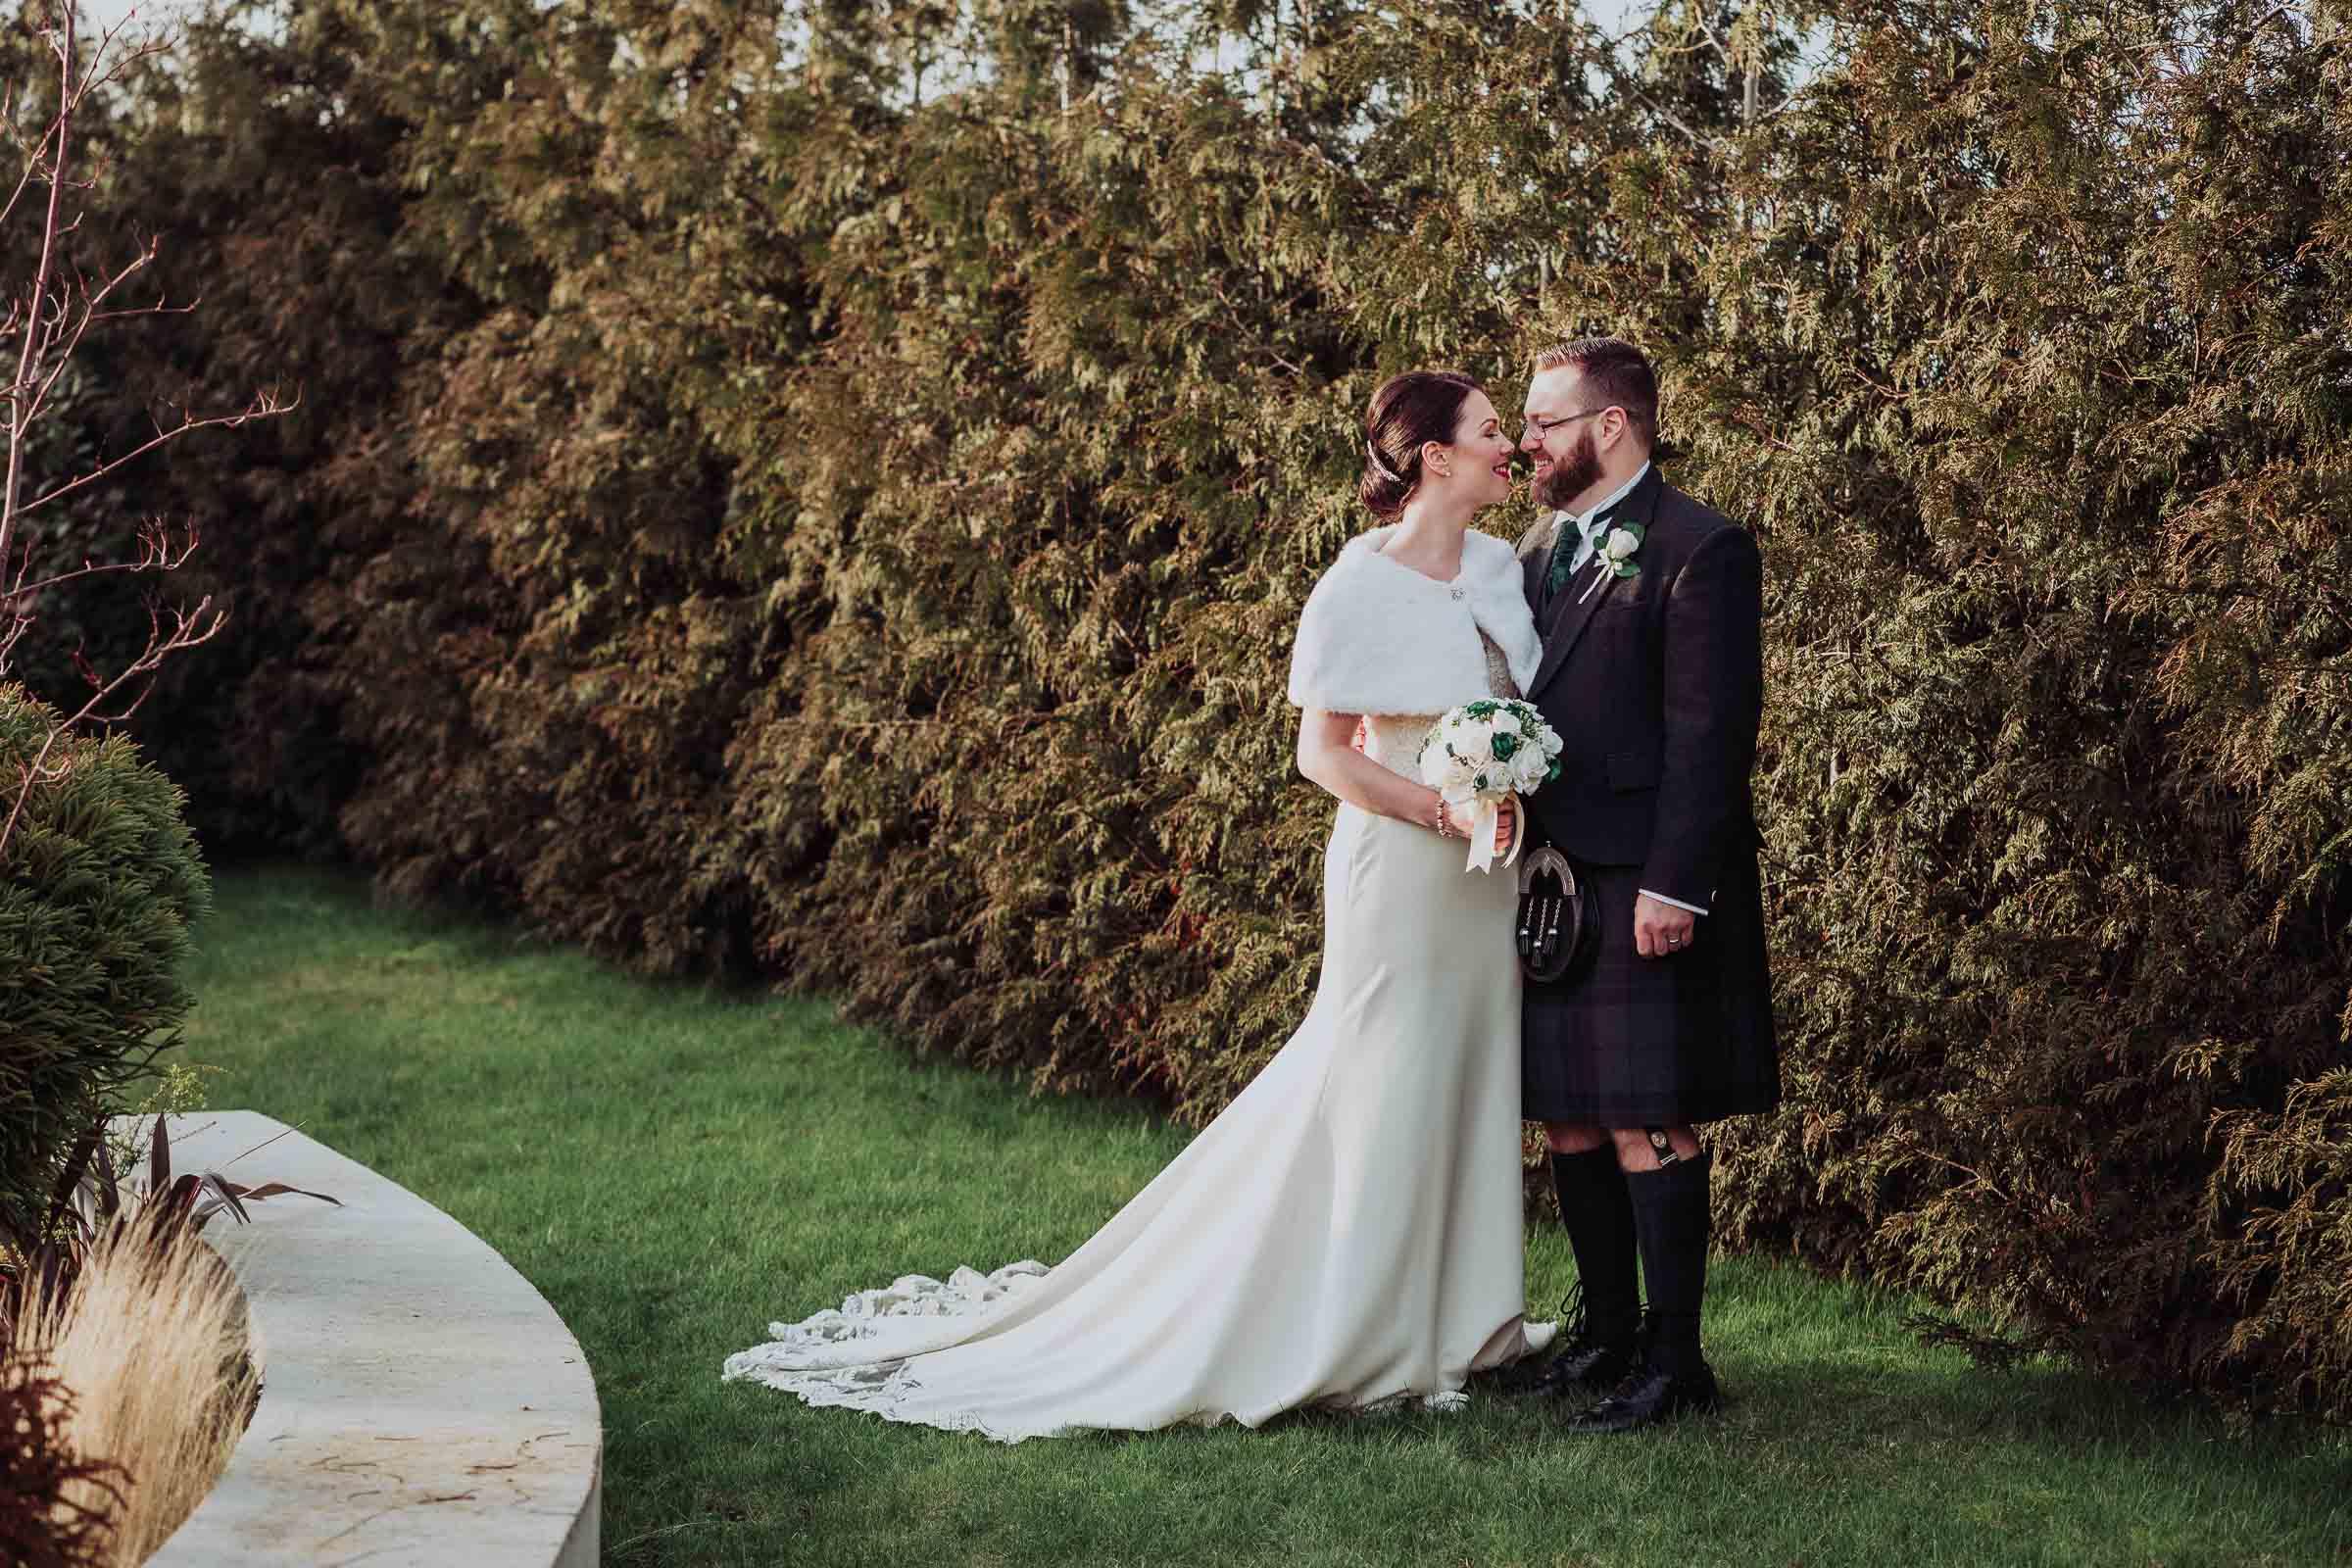 Radstone-Wedding-photographer-glasgow (1 of 1).jpg